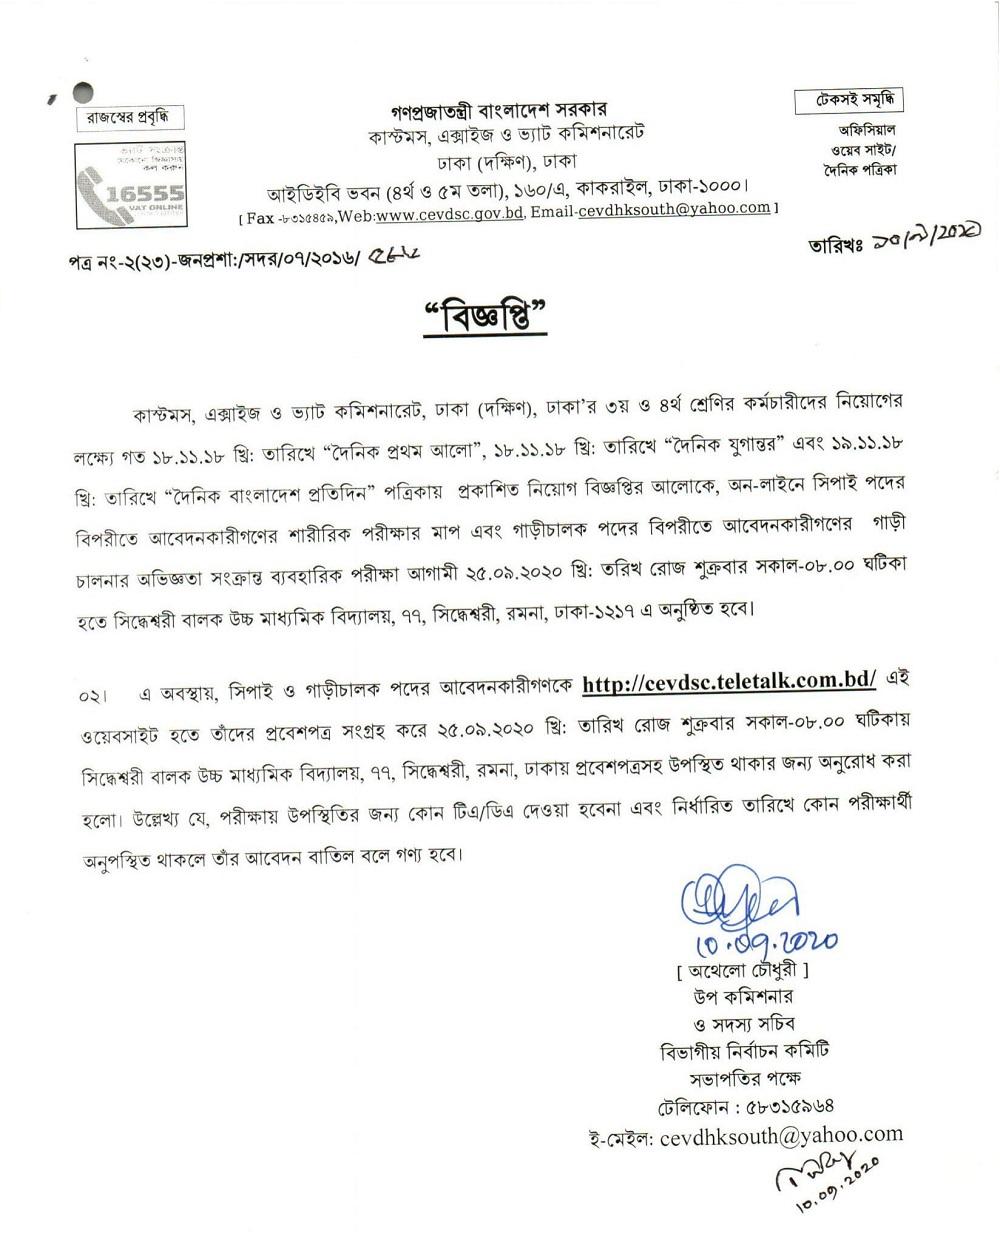 CEVDSC Teletalk Admit Card 2020 - cevdsc.teletalk.com.bd